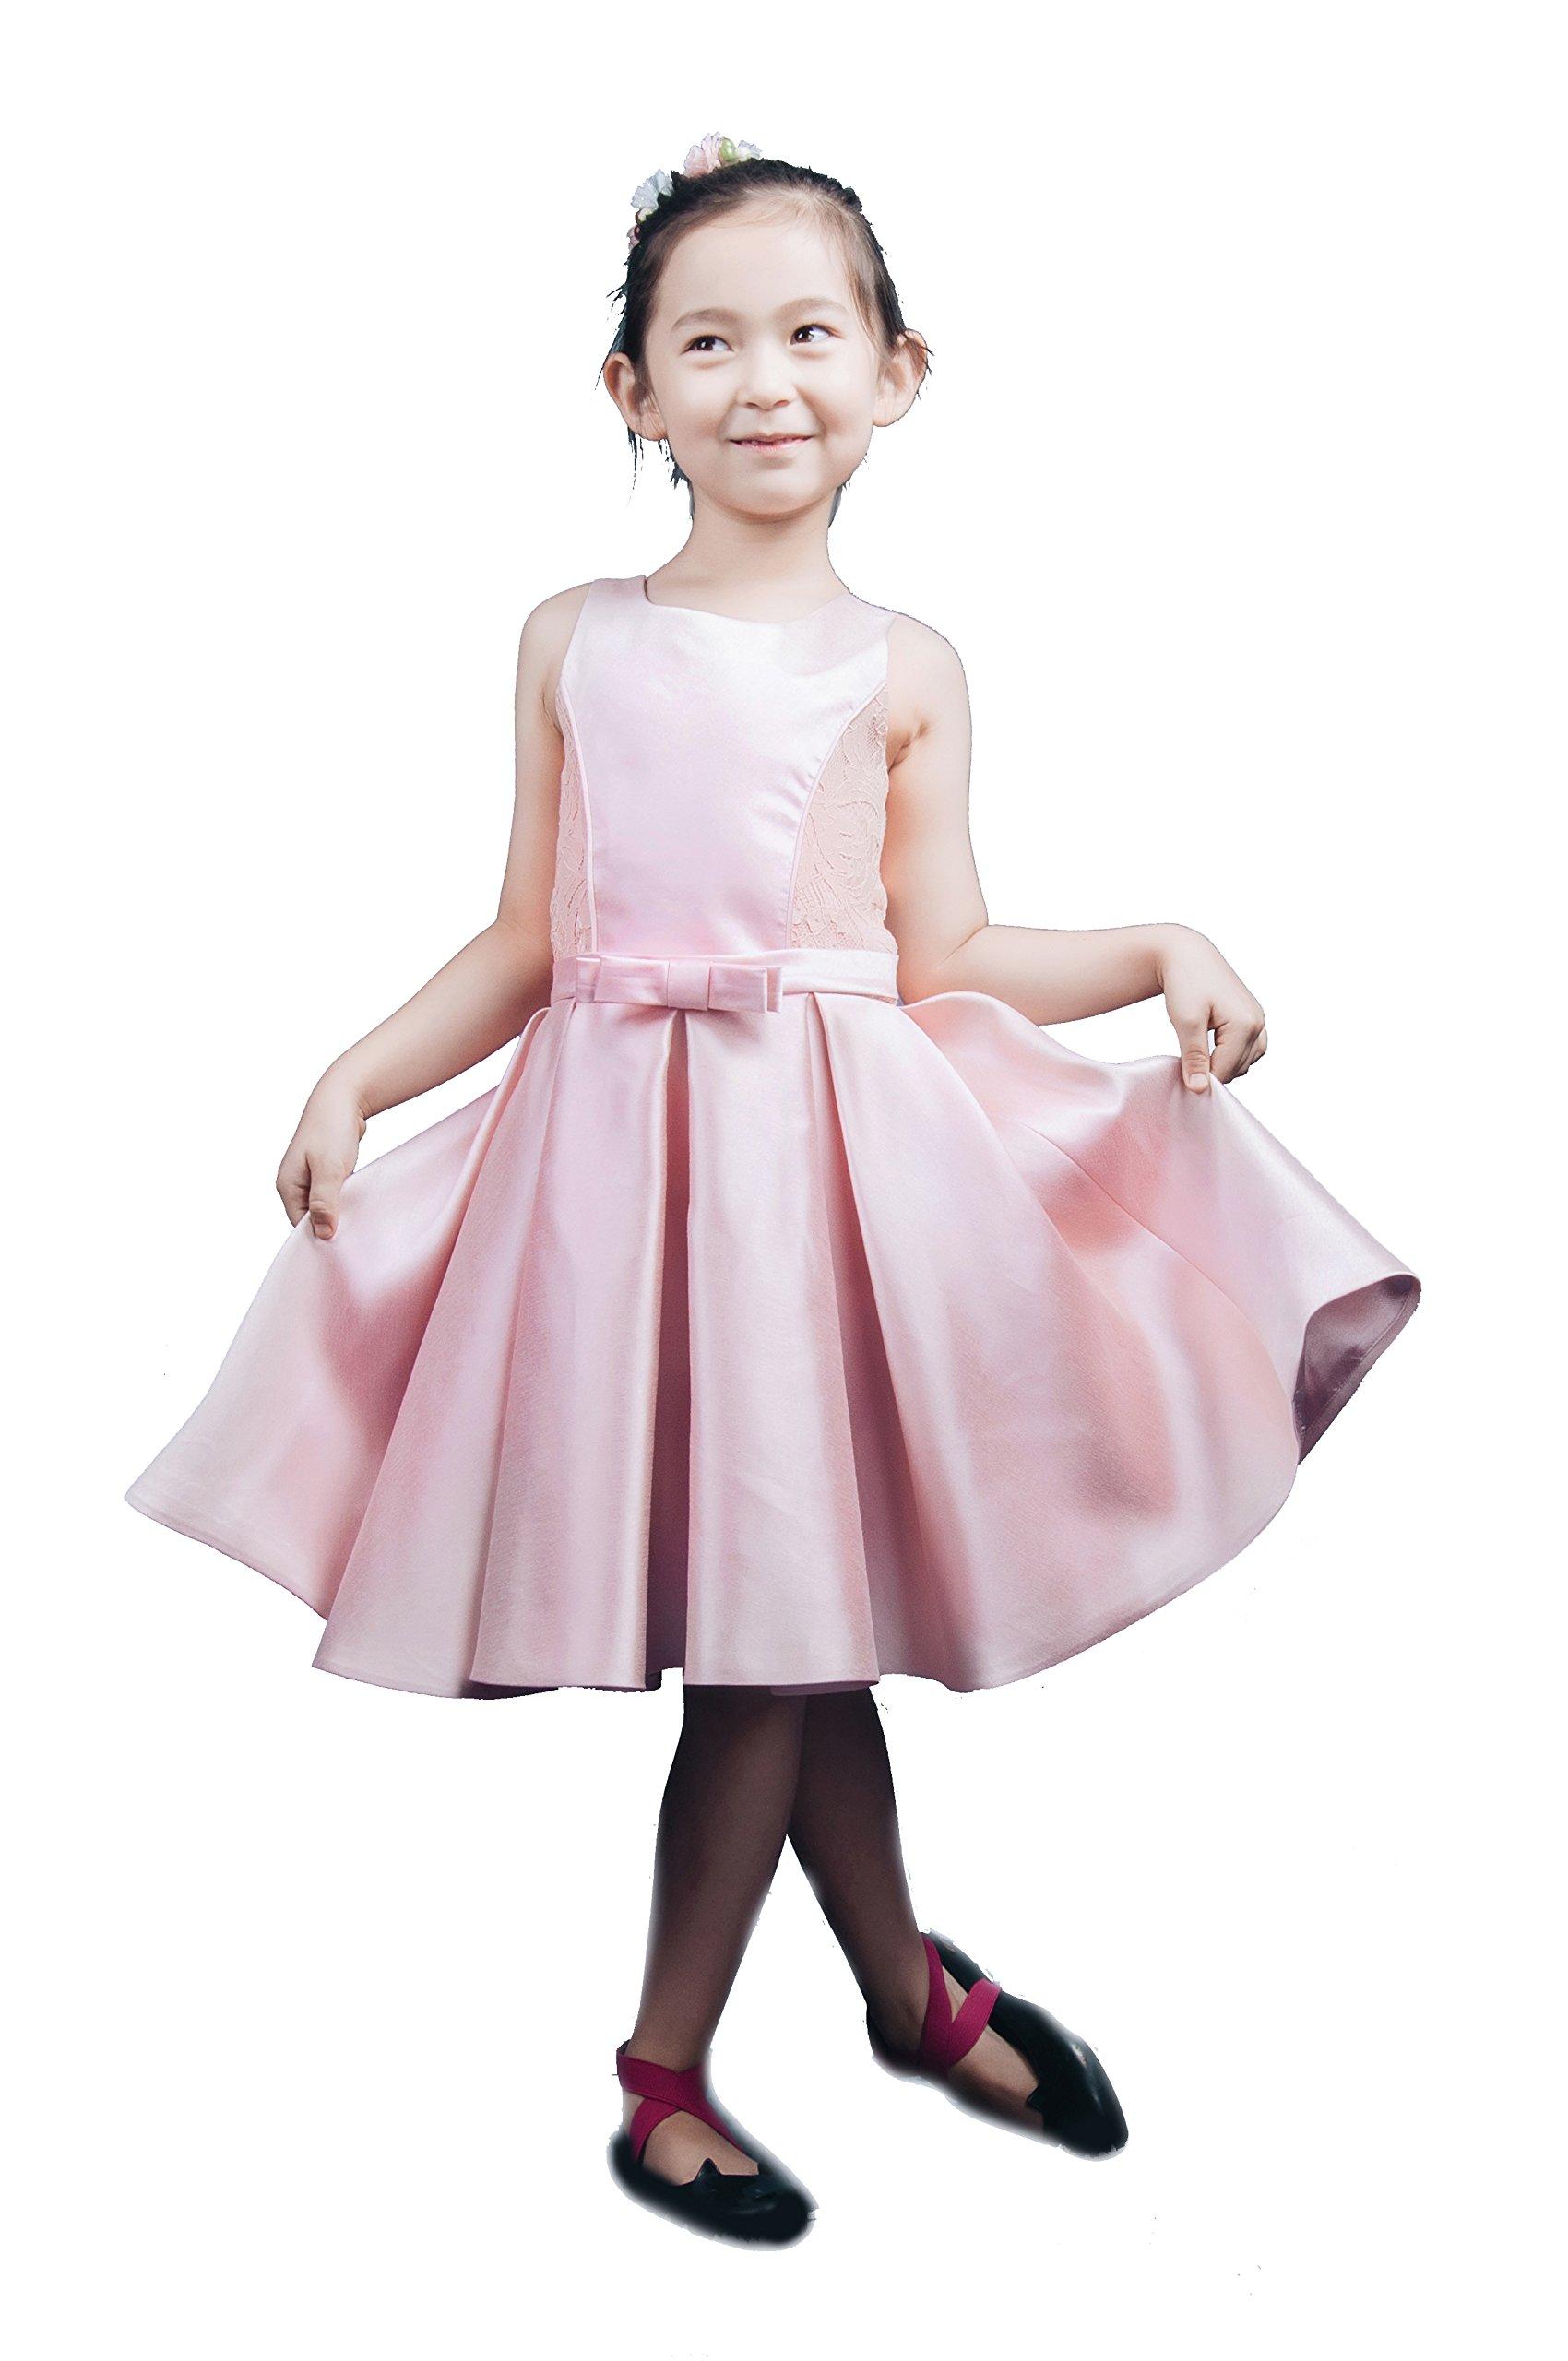 Saint Toi Lovely Mini Satin Flower Girl Princess Dress with Bow TLSCS-0014